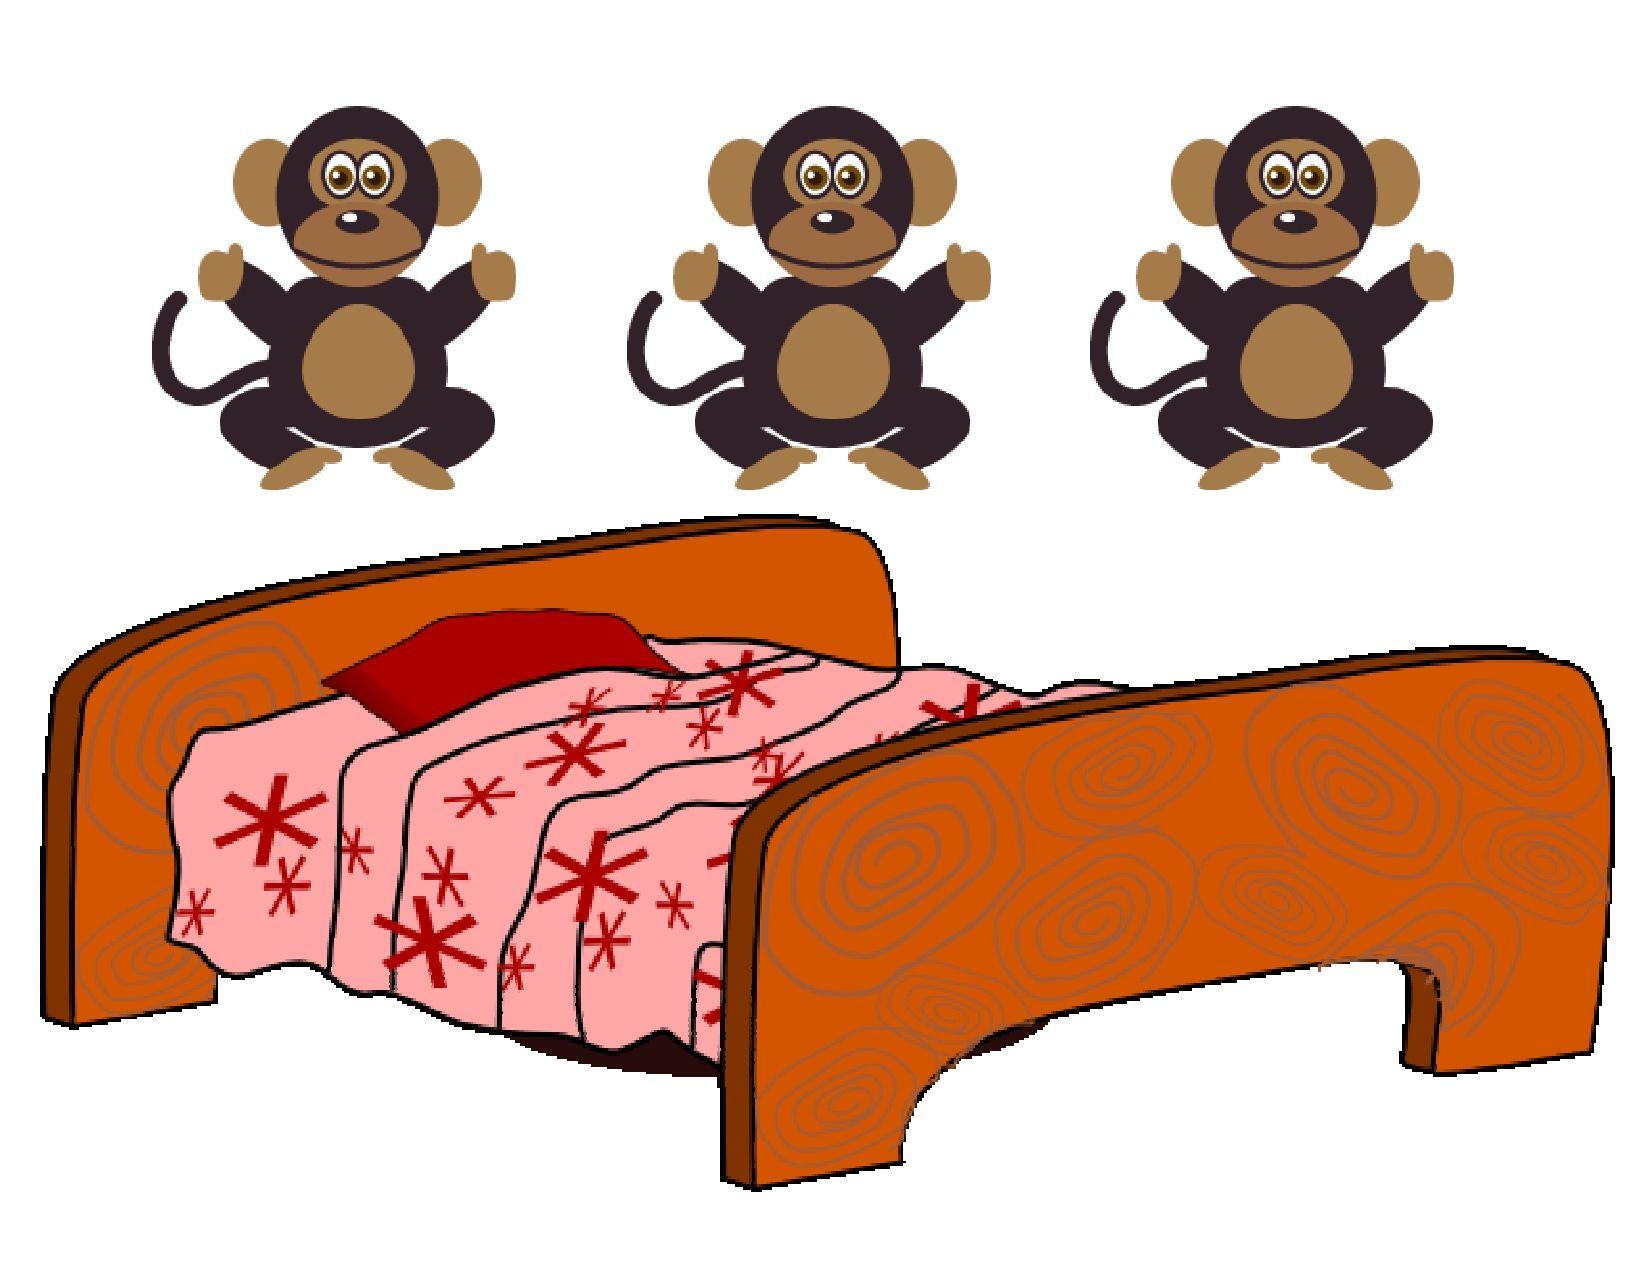 Five Little Monkeys Jumping on a Bed is a favorite.